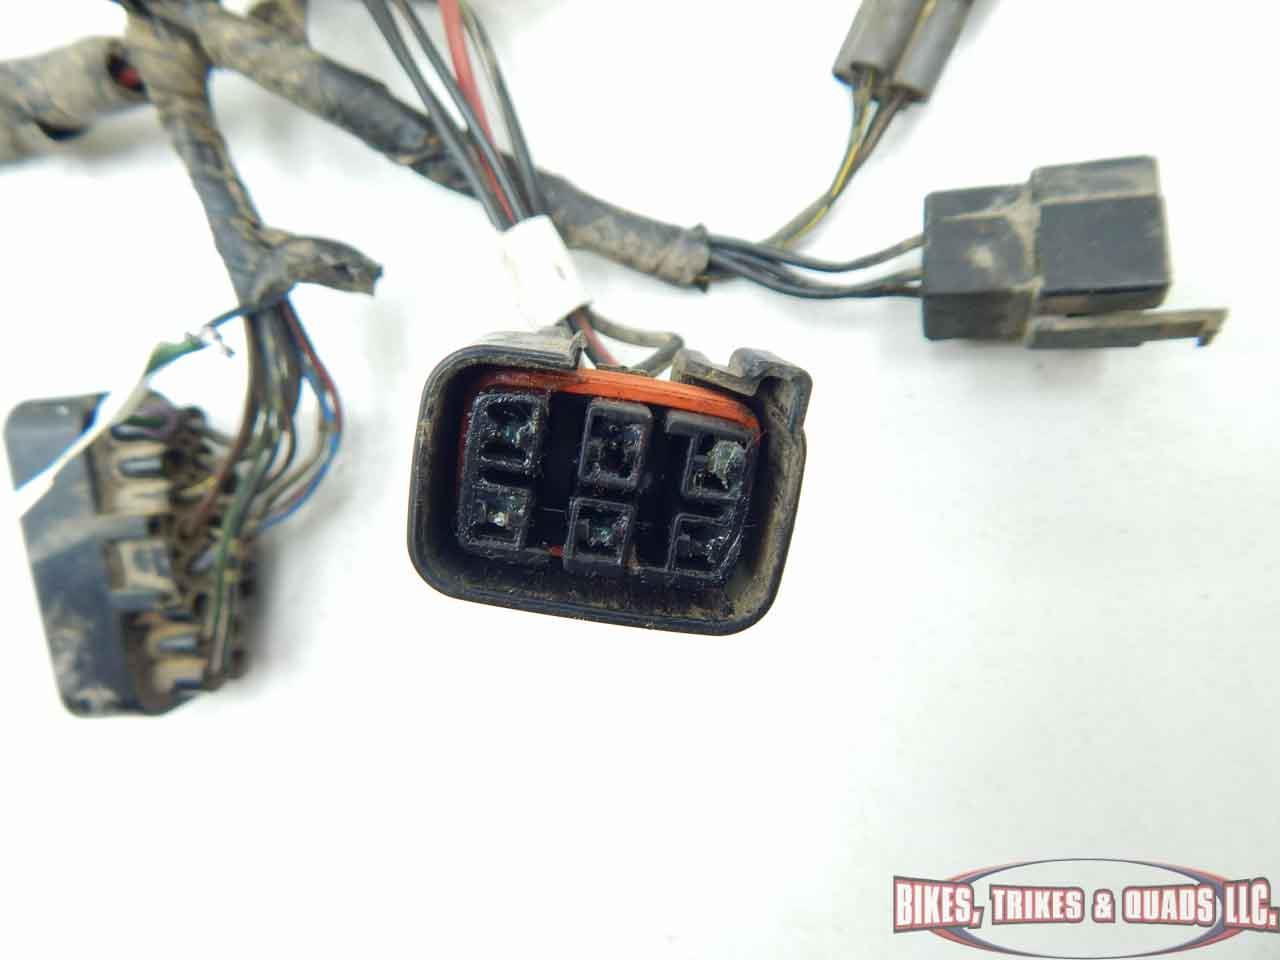 2003 suzuki quadsport ltz 400 wiring harness loom ebay. Black Bedroom Furniture Sets. Home Design Ideas